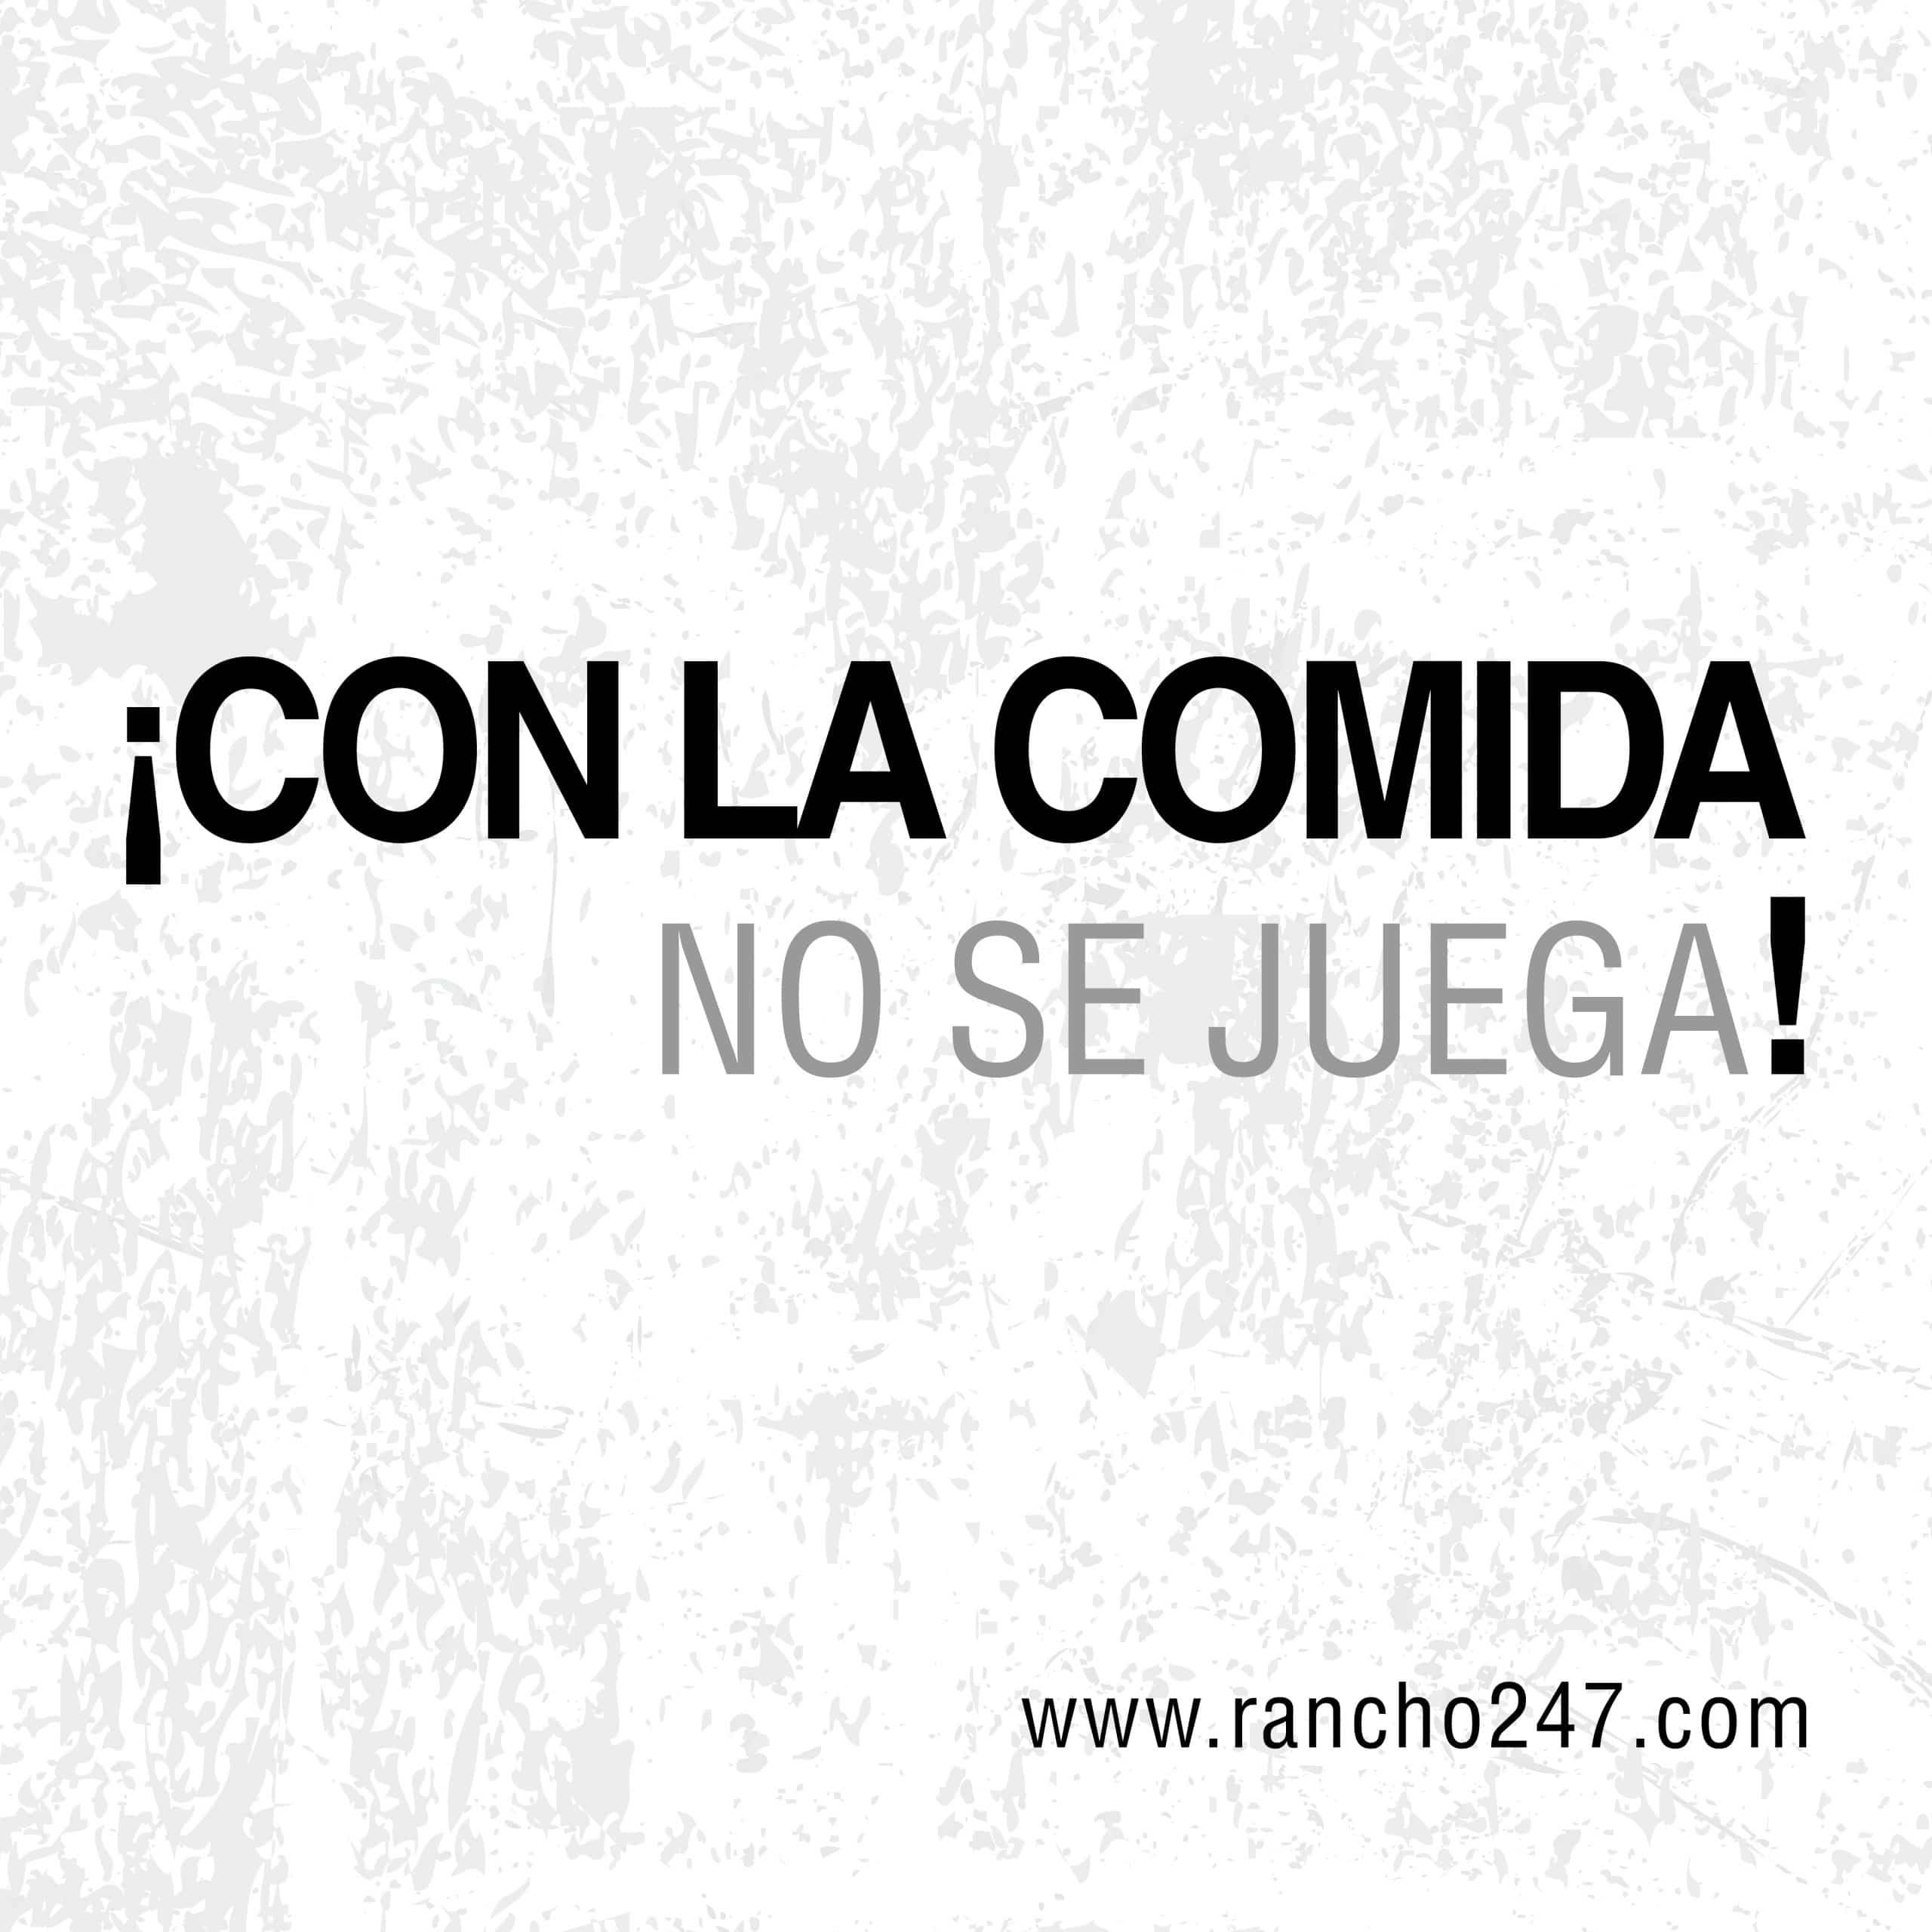 Rancho 247